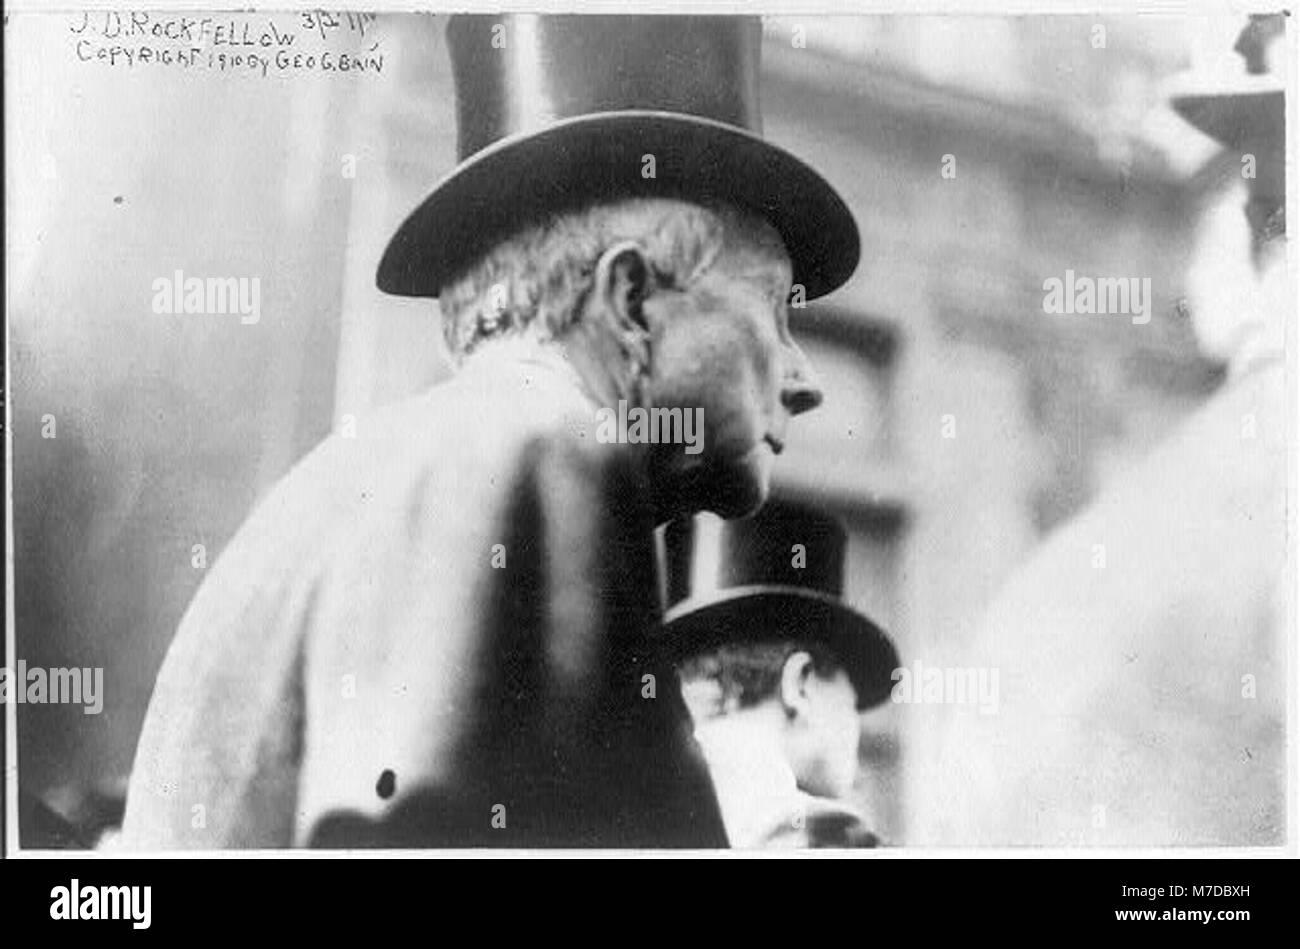 John Davison Rockefeller, 1839-1937, head-and-shoulders portrait, profile LCCN2005689247 - Stock Image